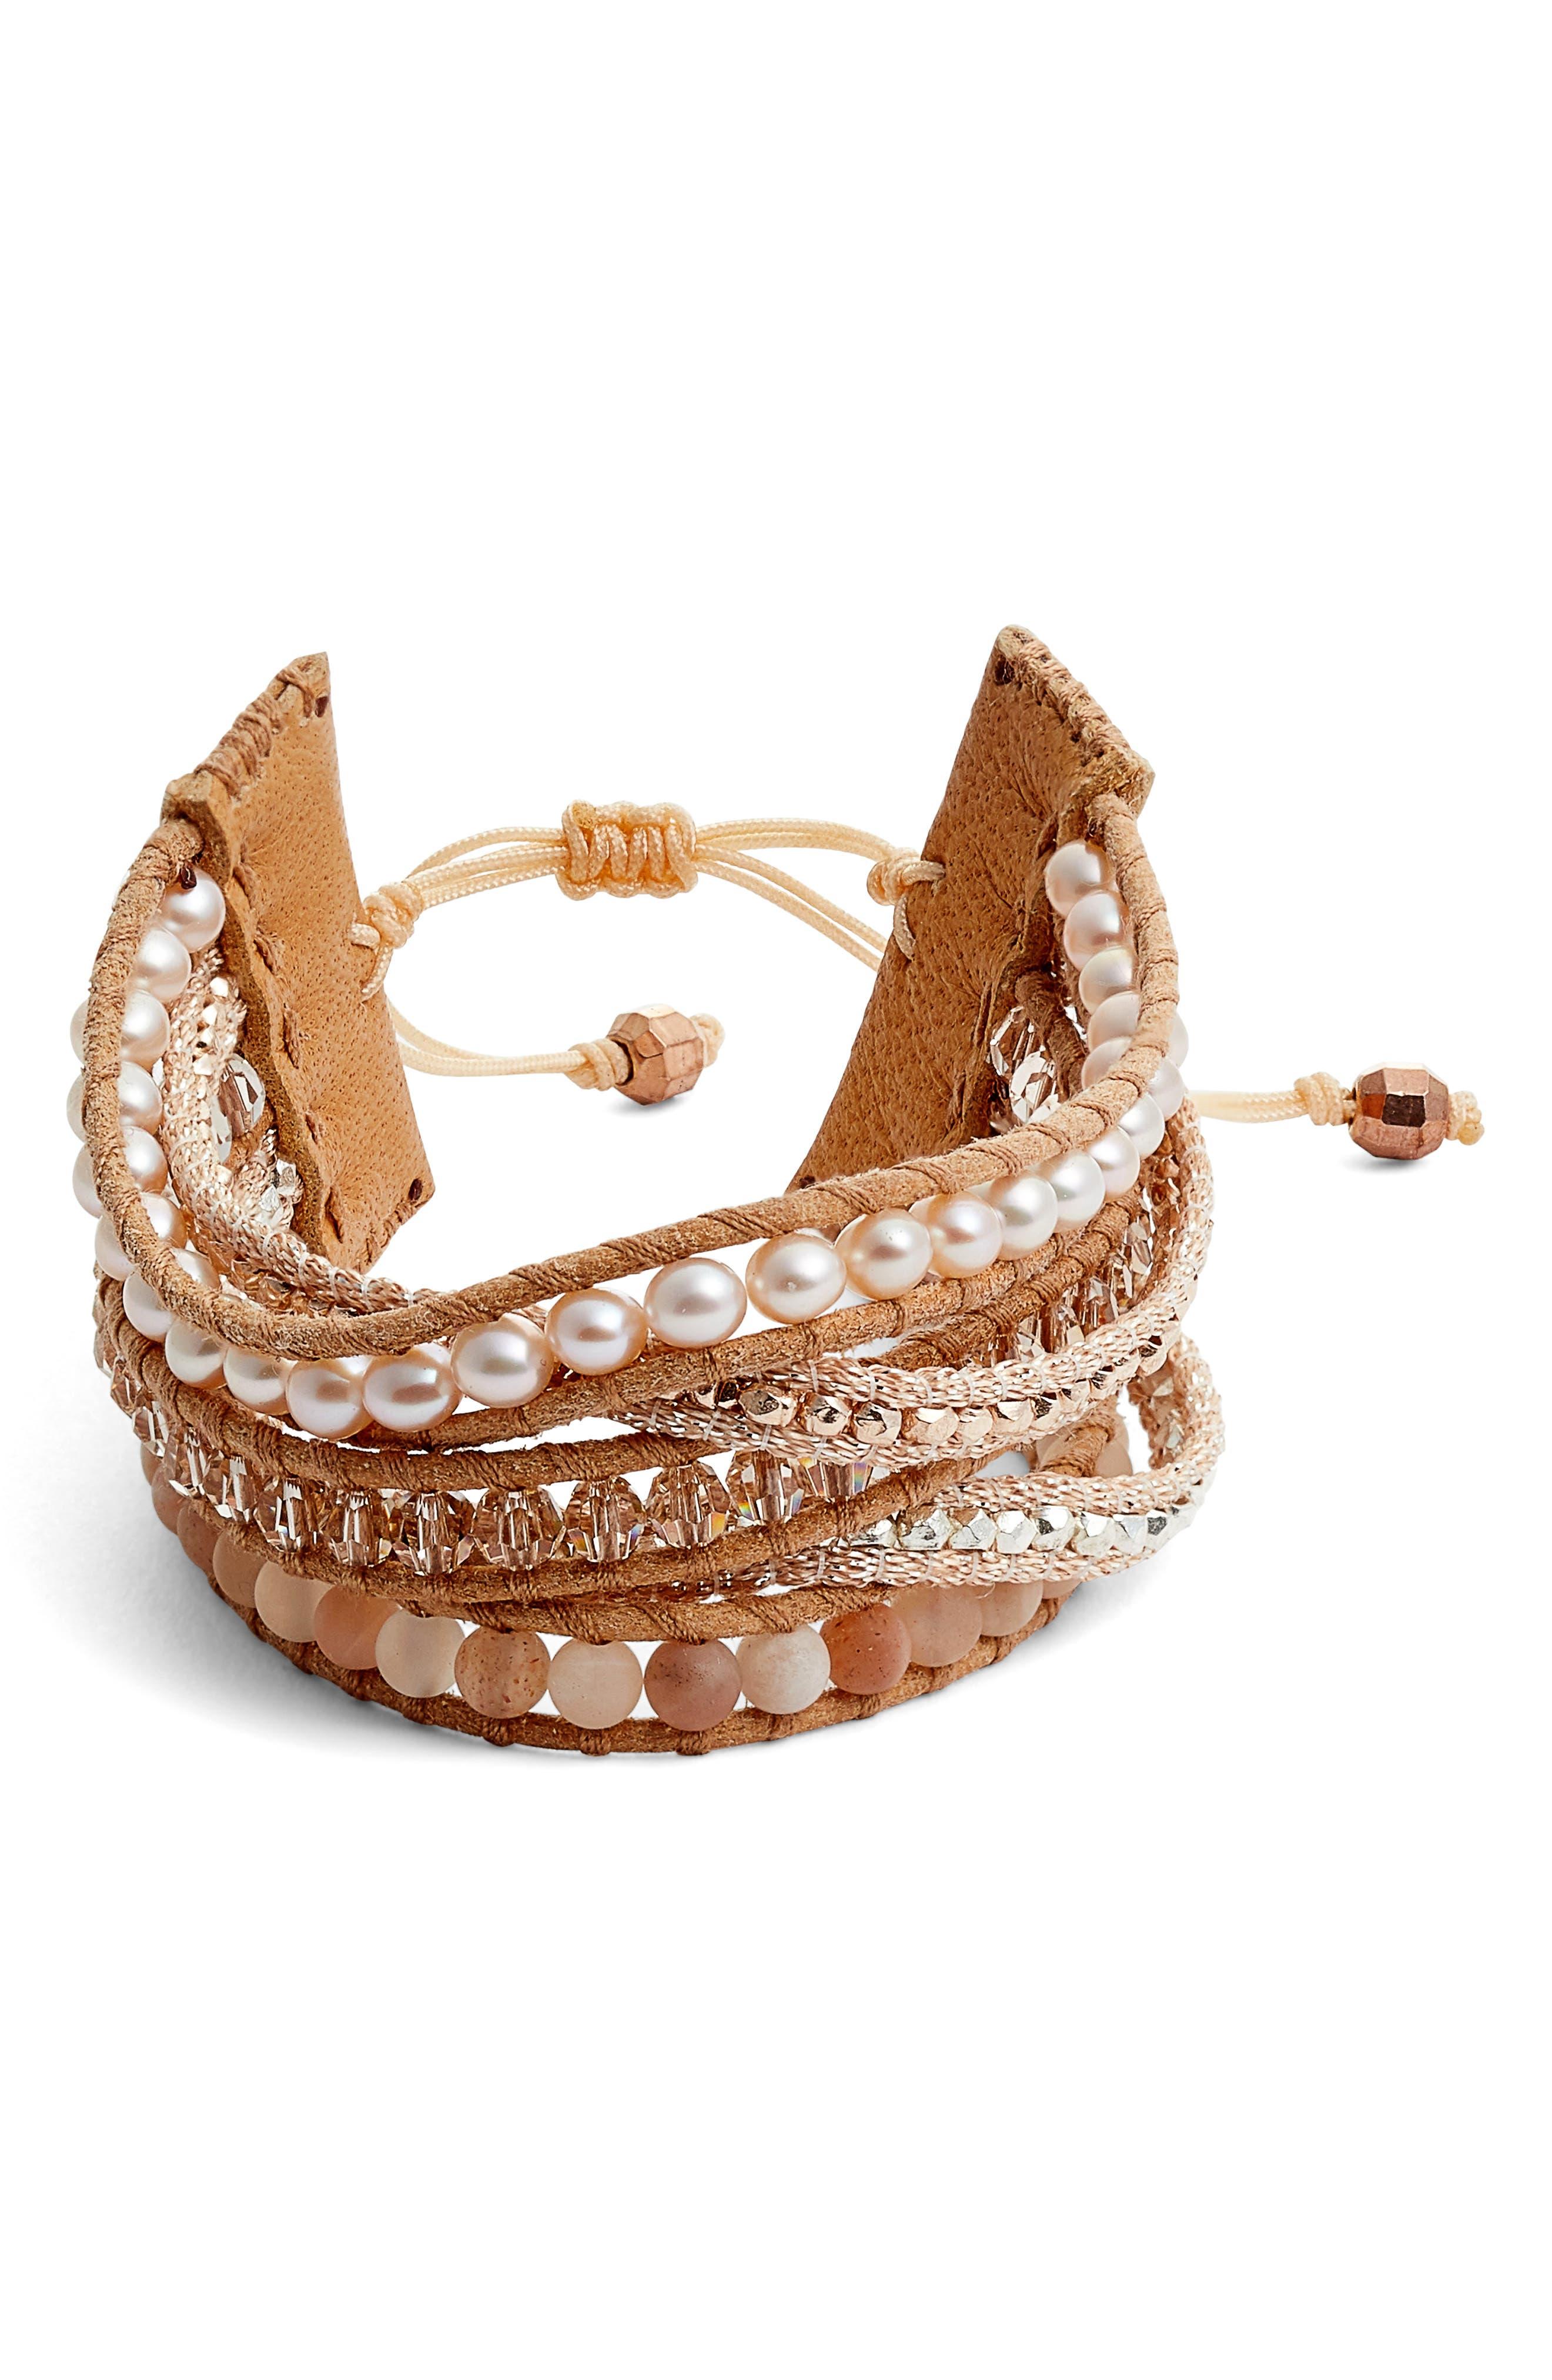 Chan Luu Multistrand Pull Tie Pearl Mix Bracelet